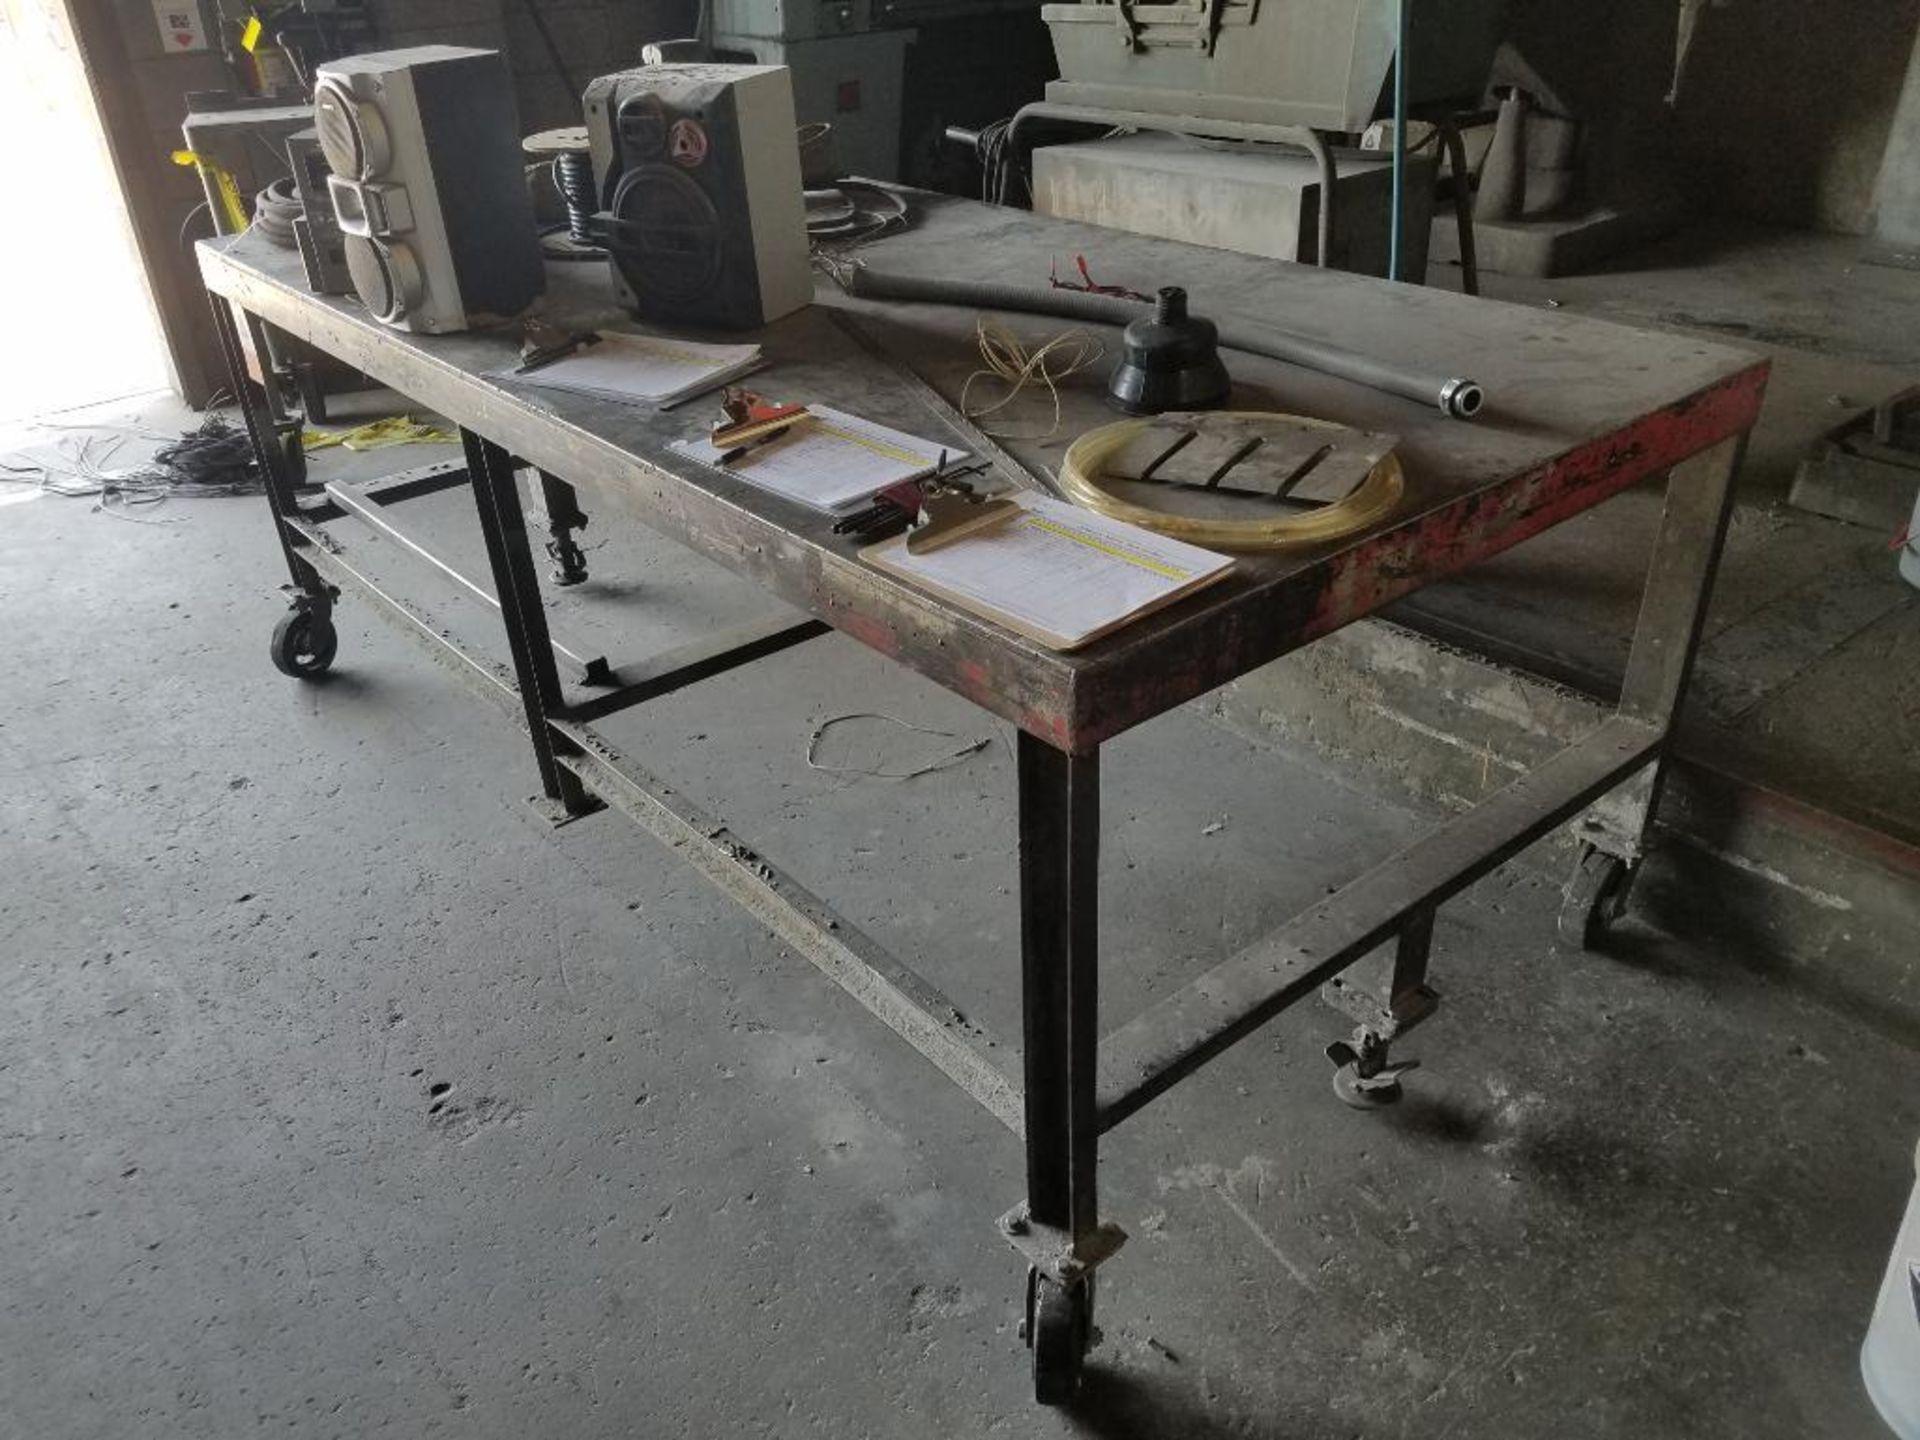 steel welding table - Image 2 of 3